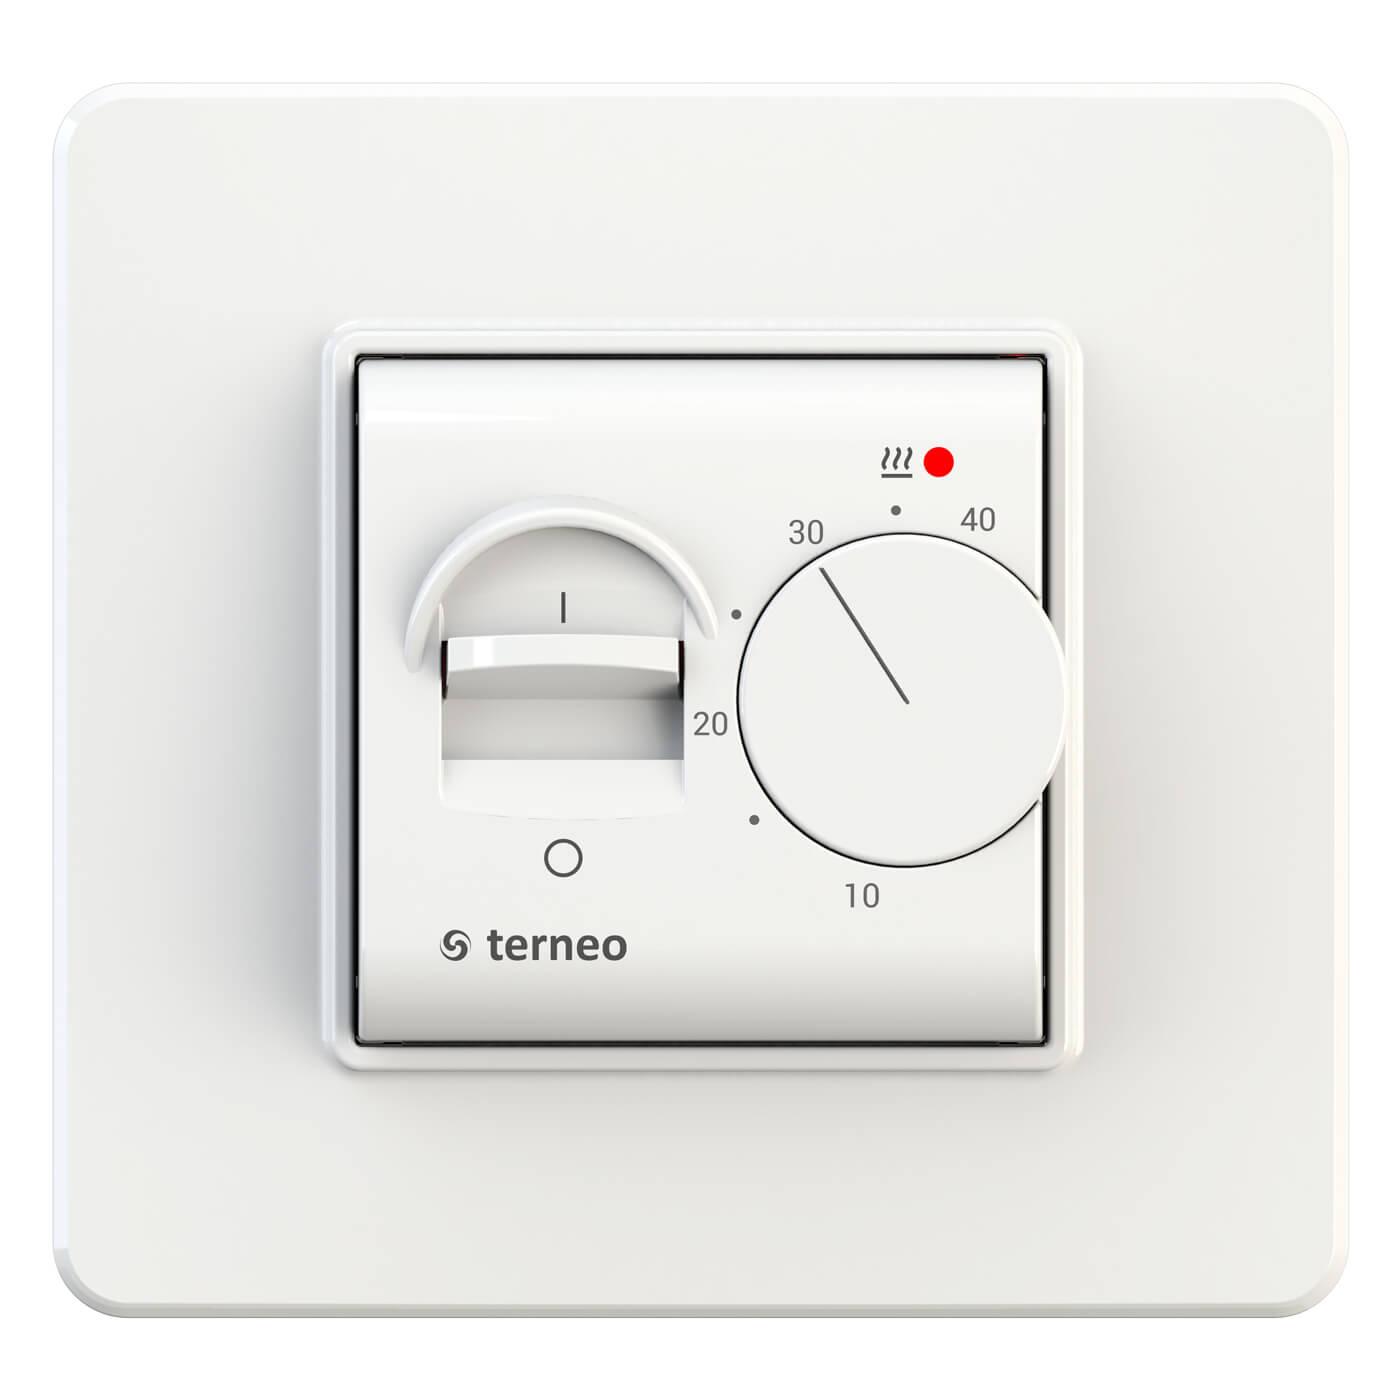 Терморегулятор Terneo mex unic белый